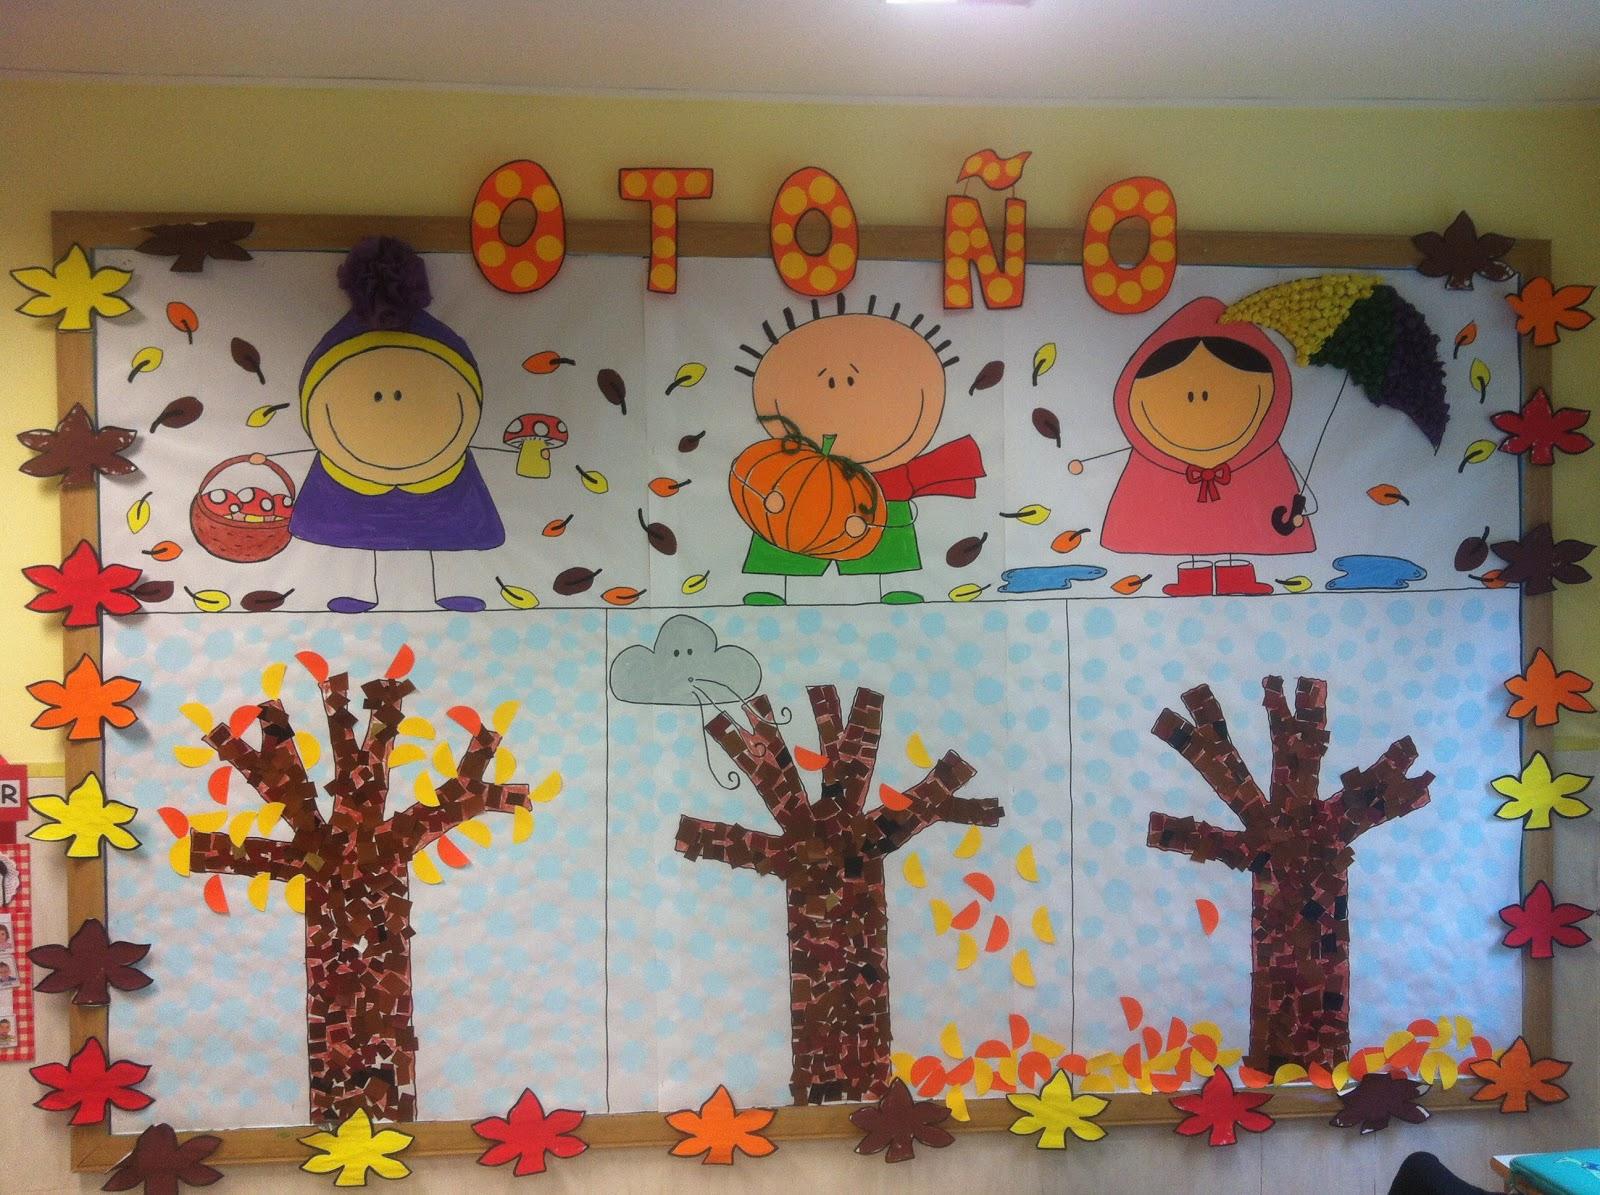 Se orita gominola mural de oto o for Decoracion otono infantil